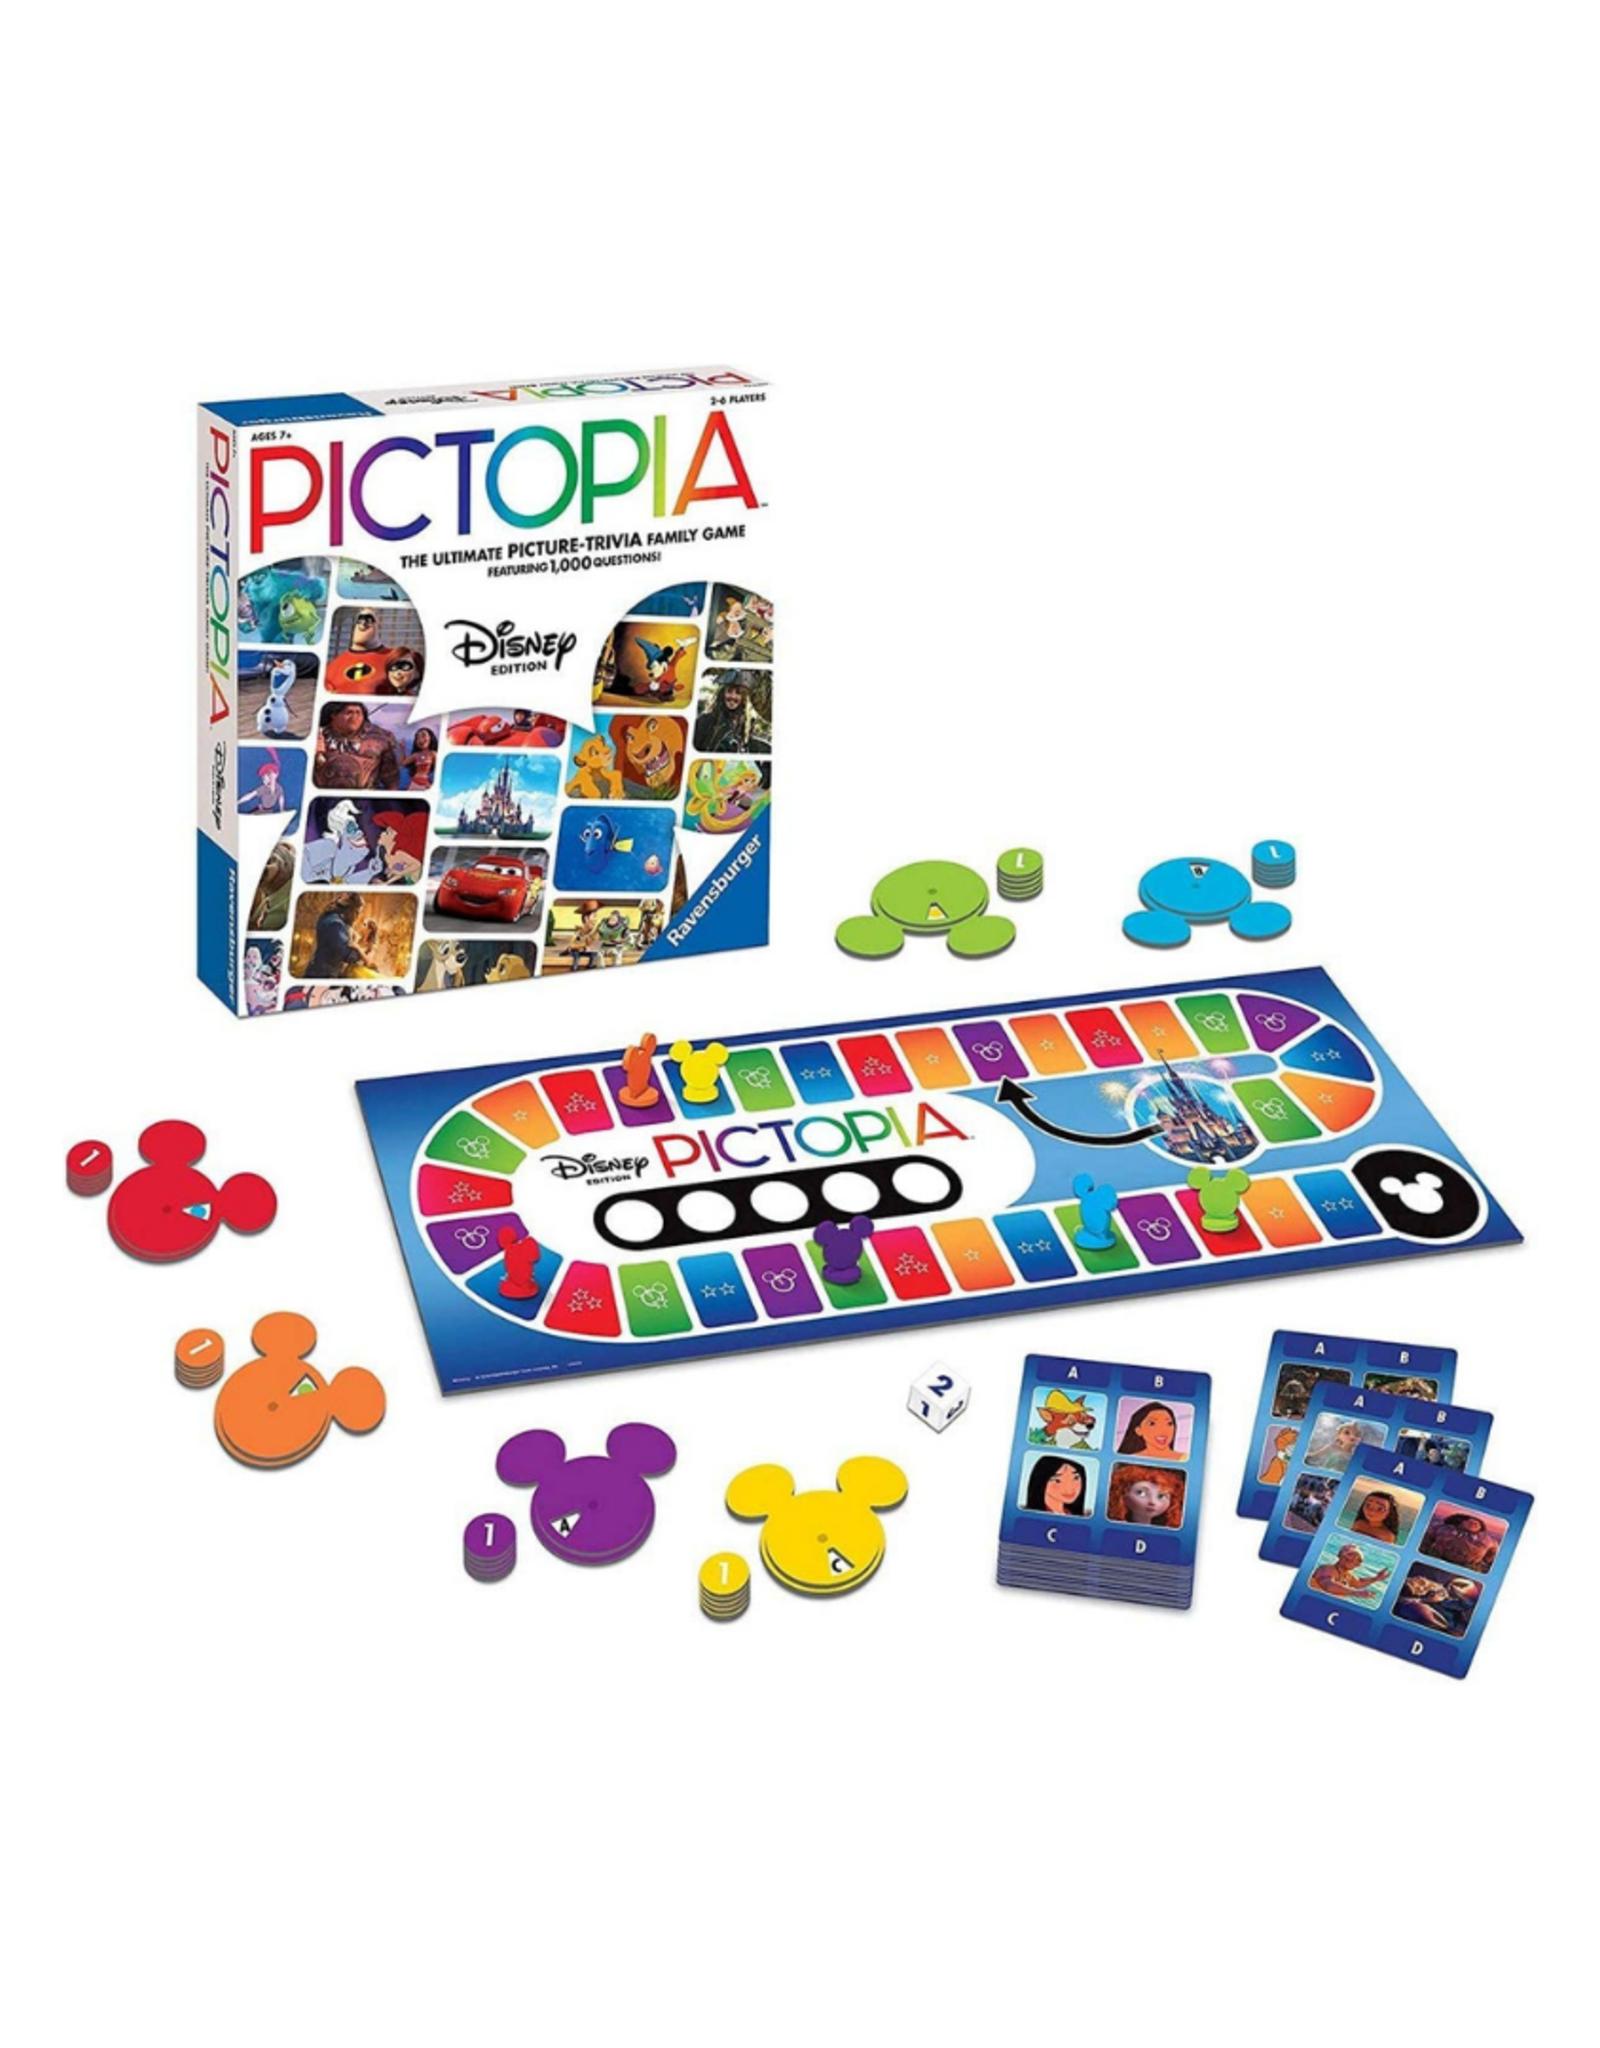 Wonder Forge Pictopia: Disney Edition